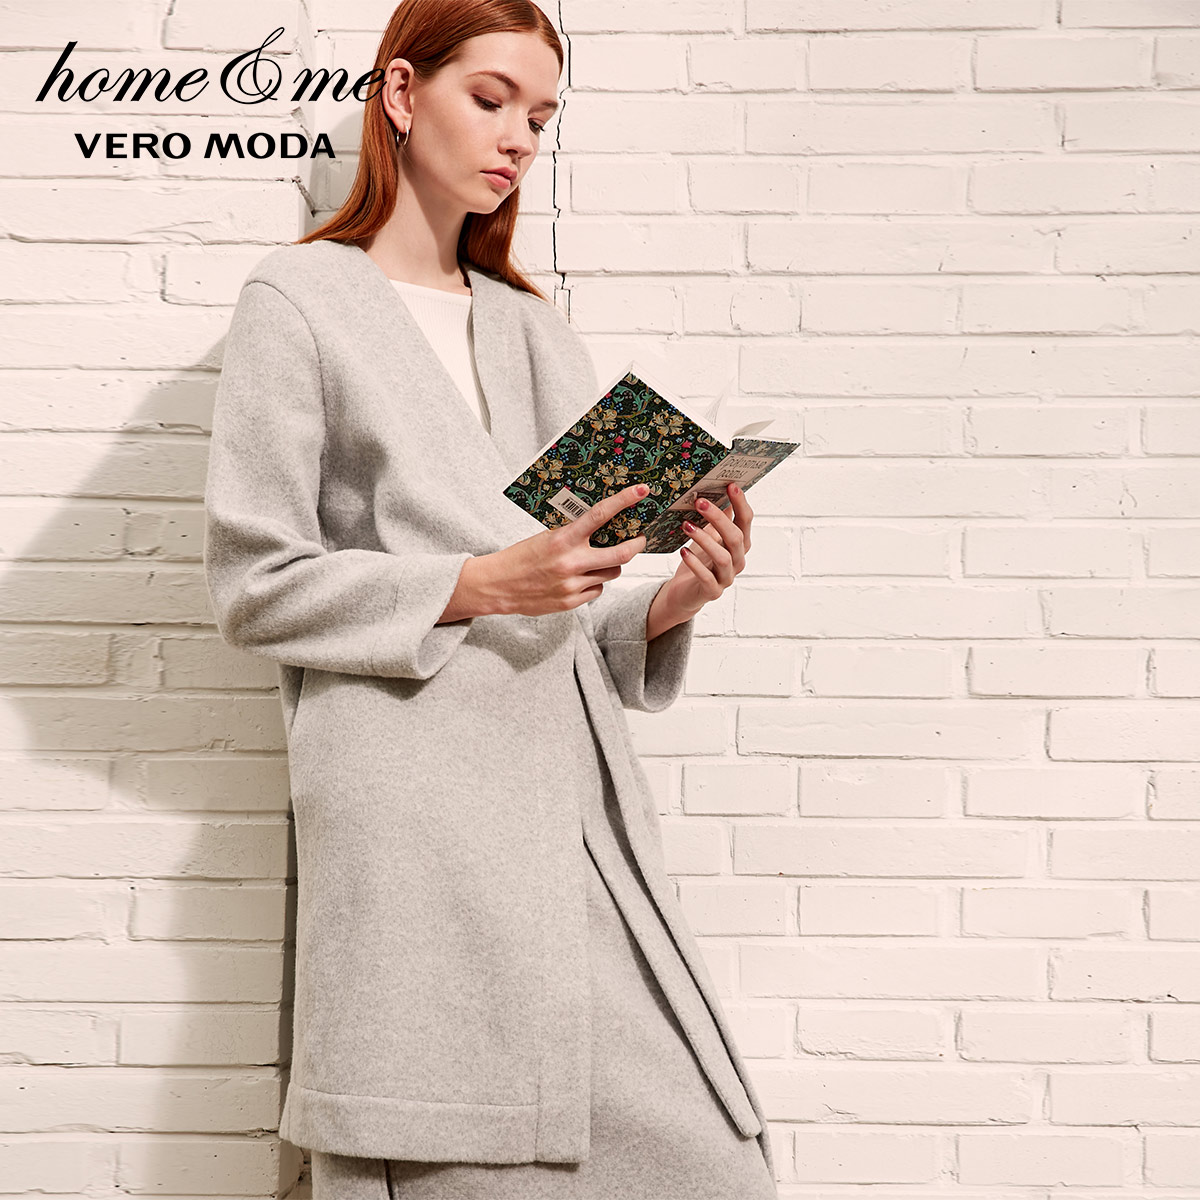 Vero Moda New Women's Mid-length Waist Belt Knitted Cardigan | 3184R3507